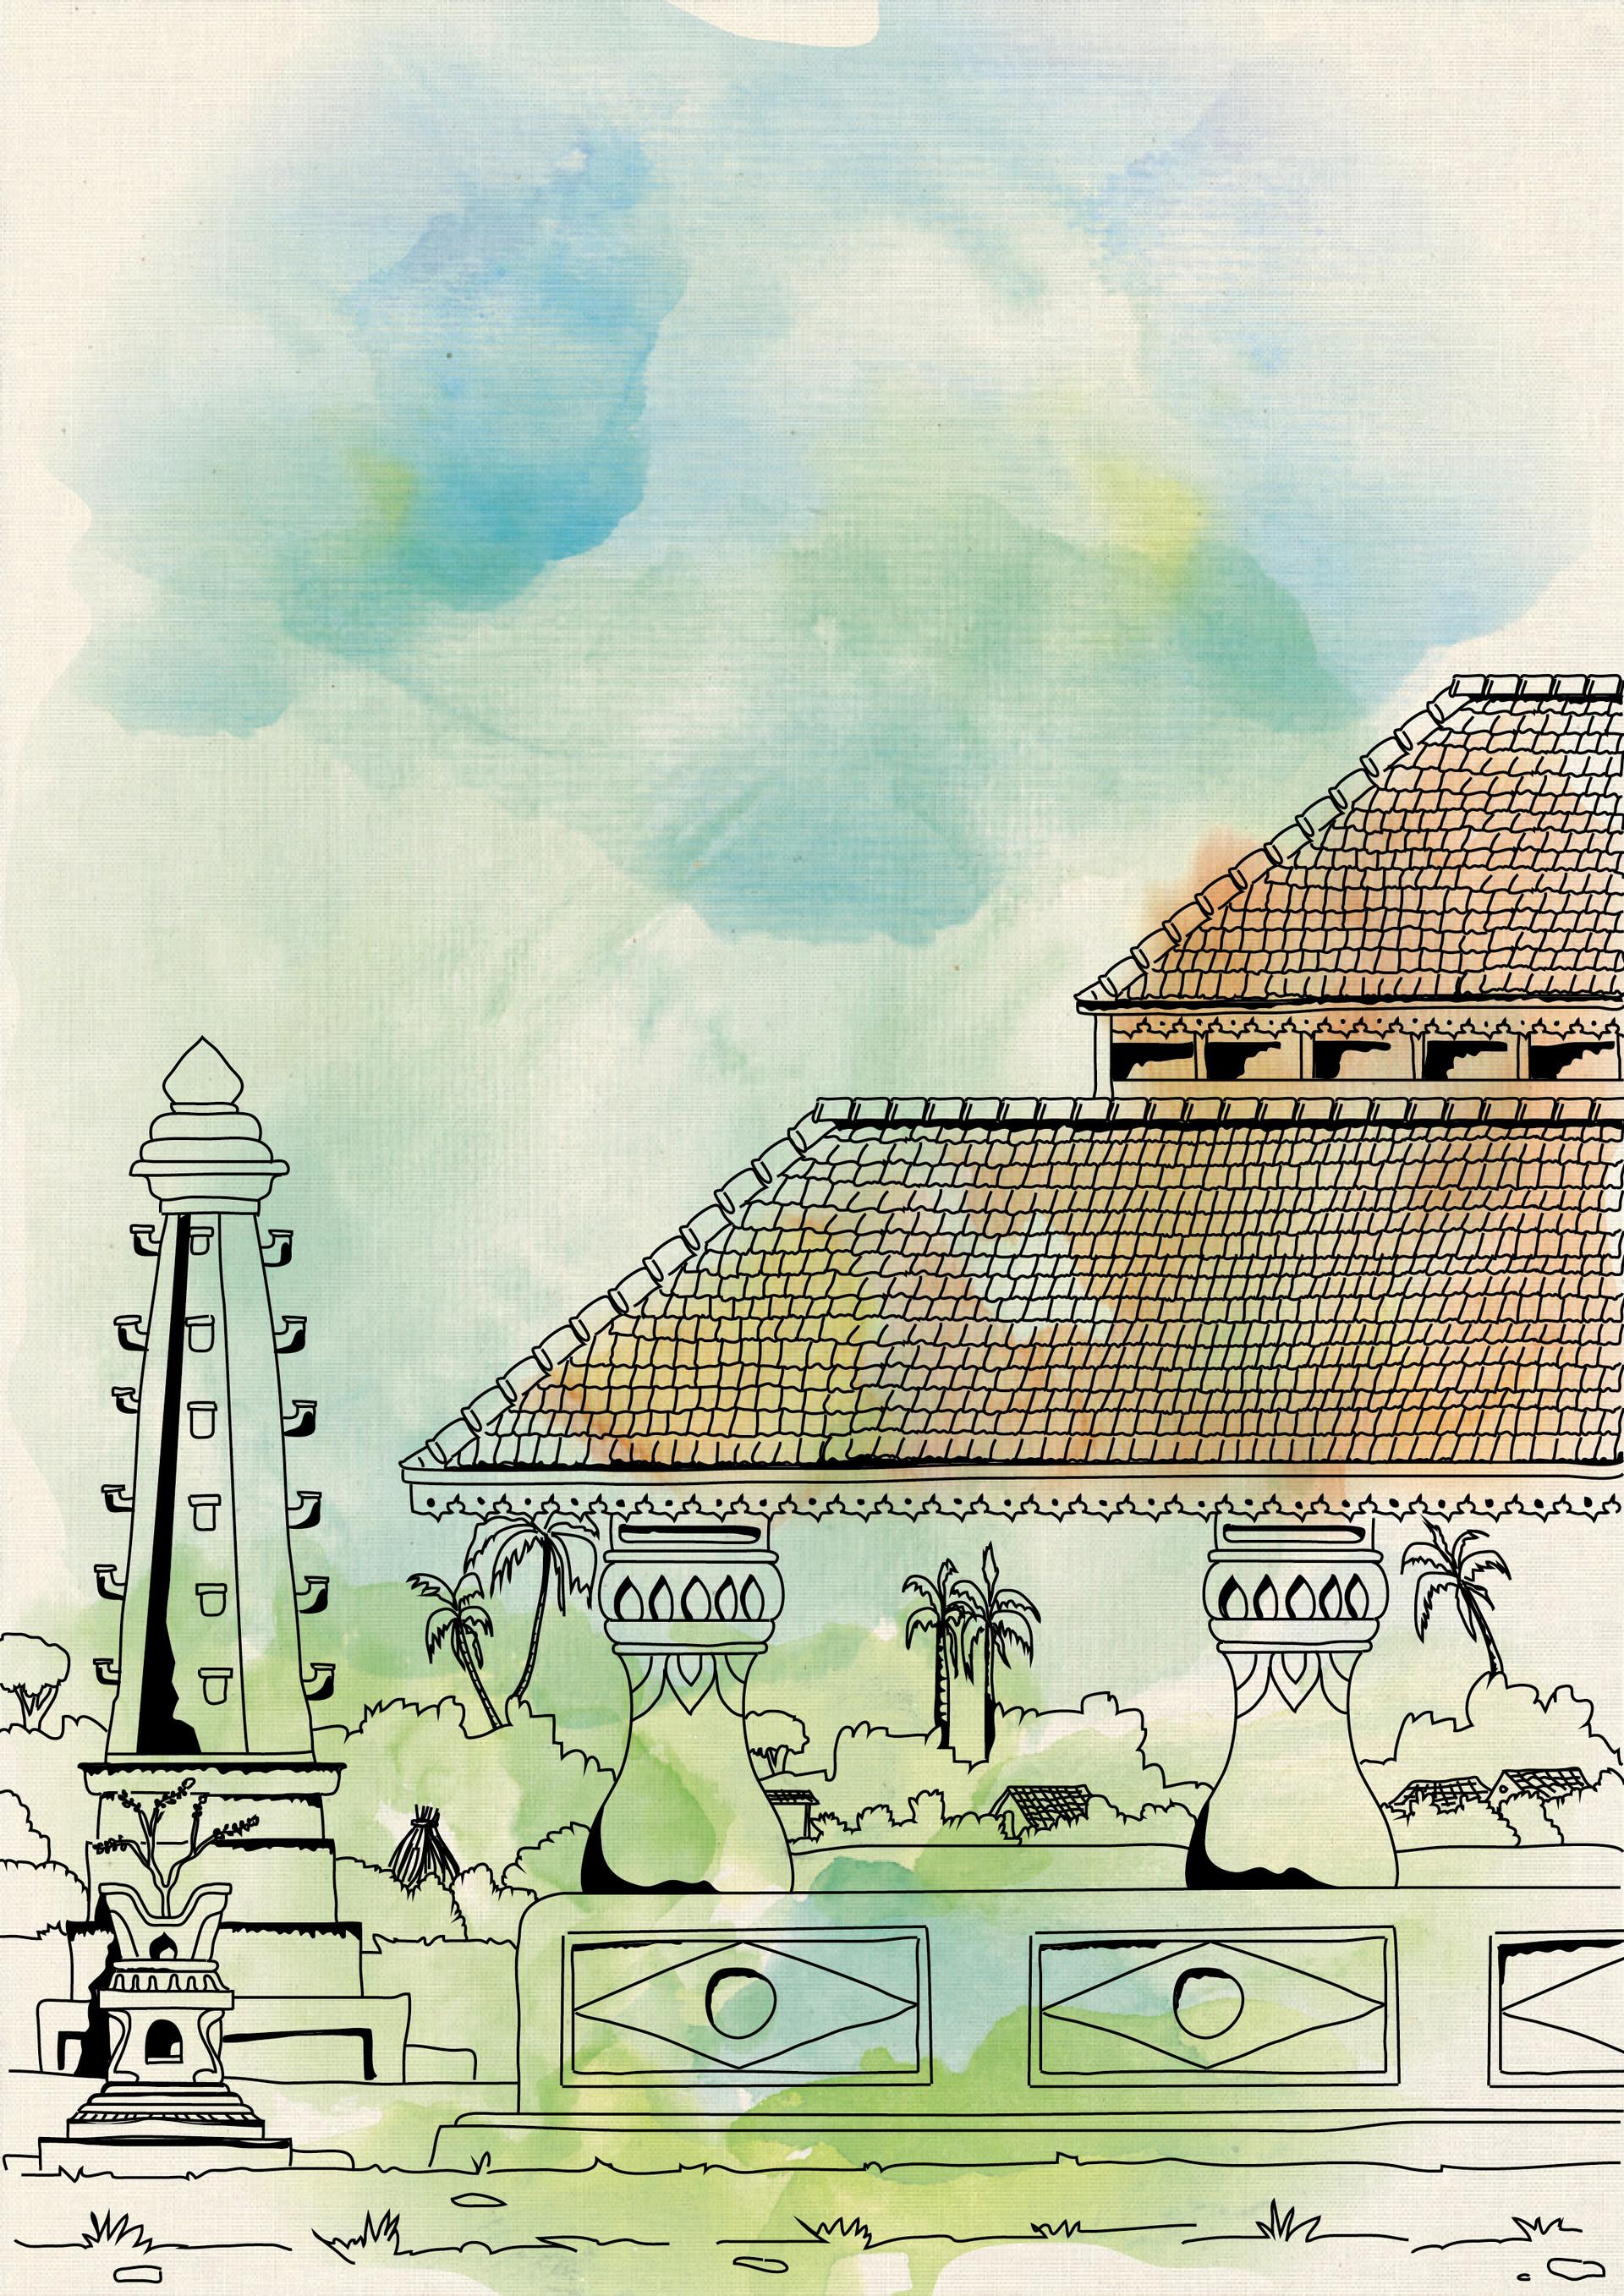 Rajesh sawant konkan temple 01